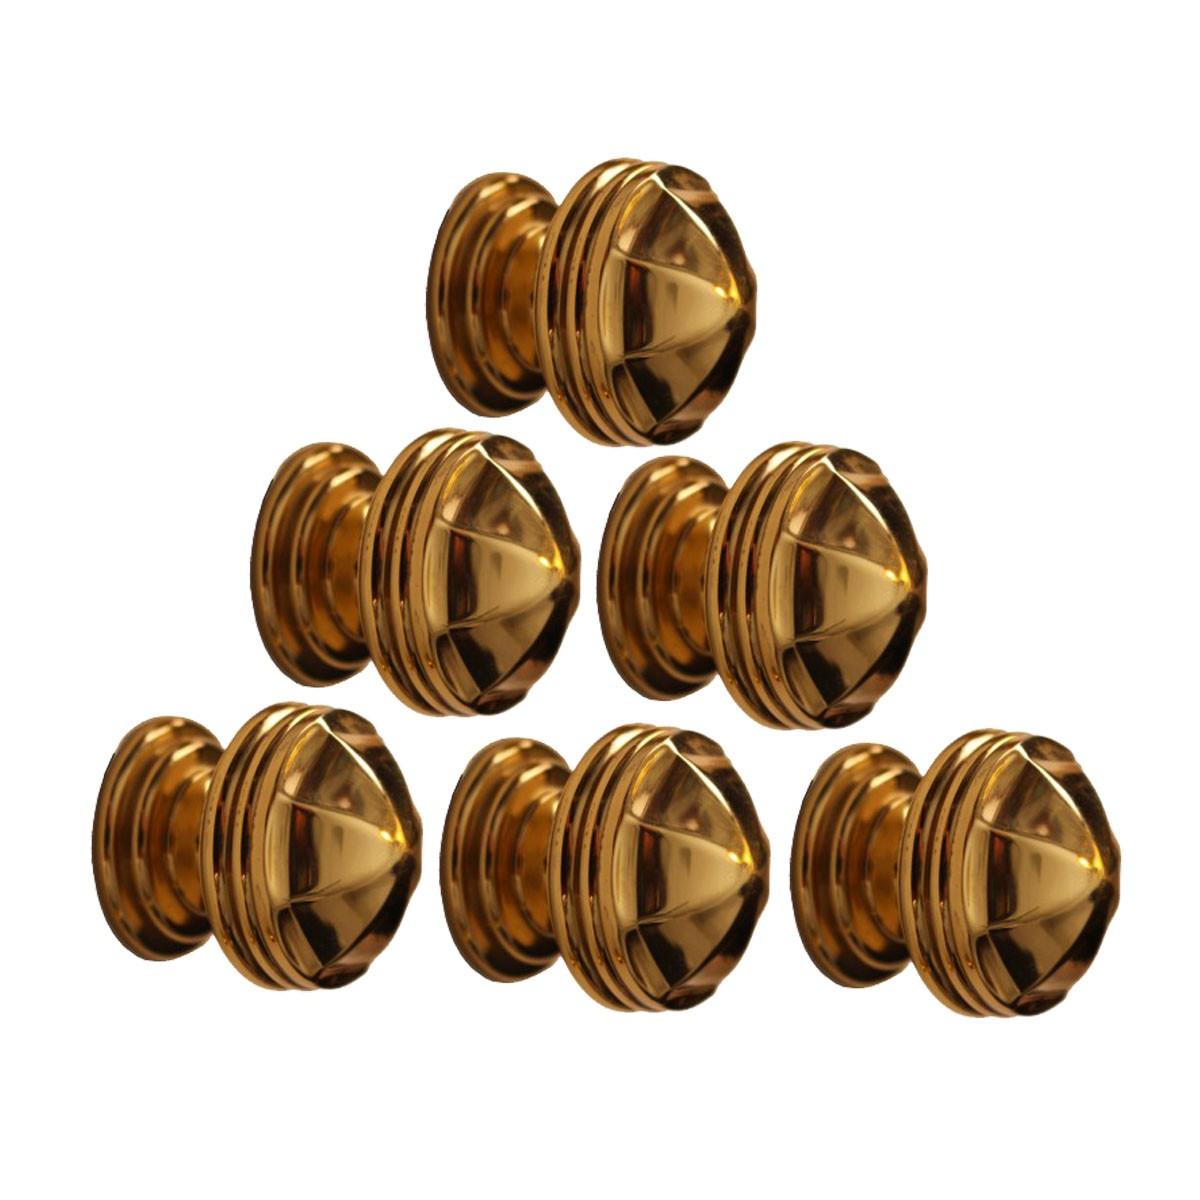 10 cabinet knob bright brass 1 1 4 dia octagonal. Black Bedroom Furniture Sets. Home Design Ideas